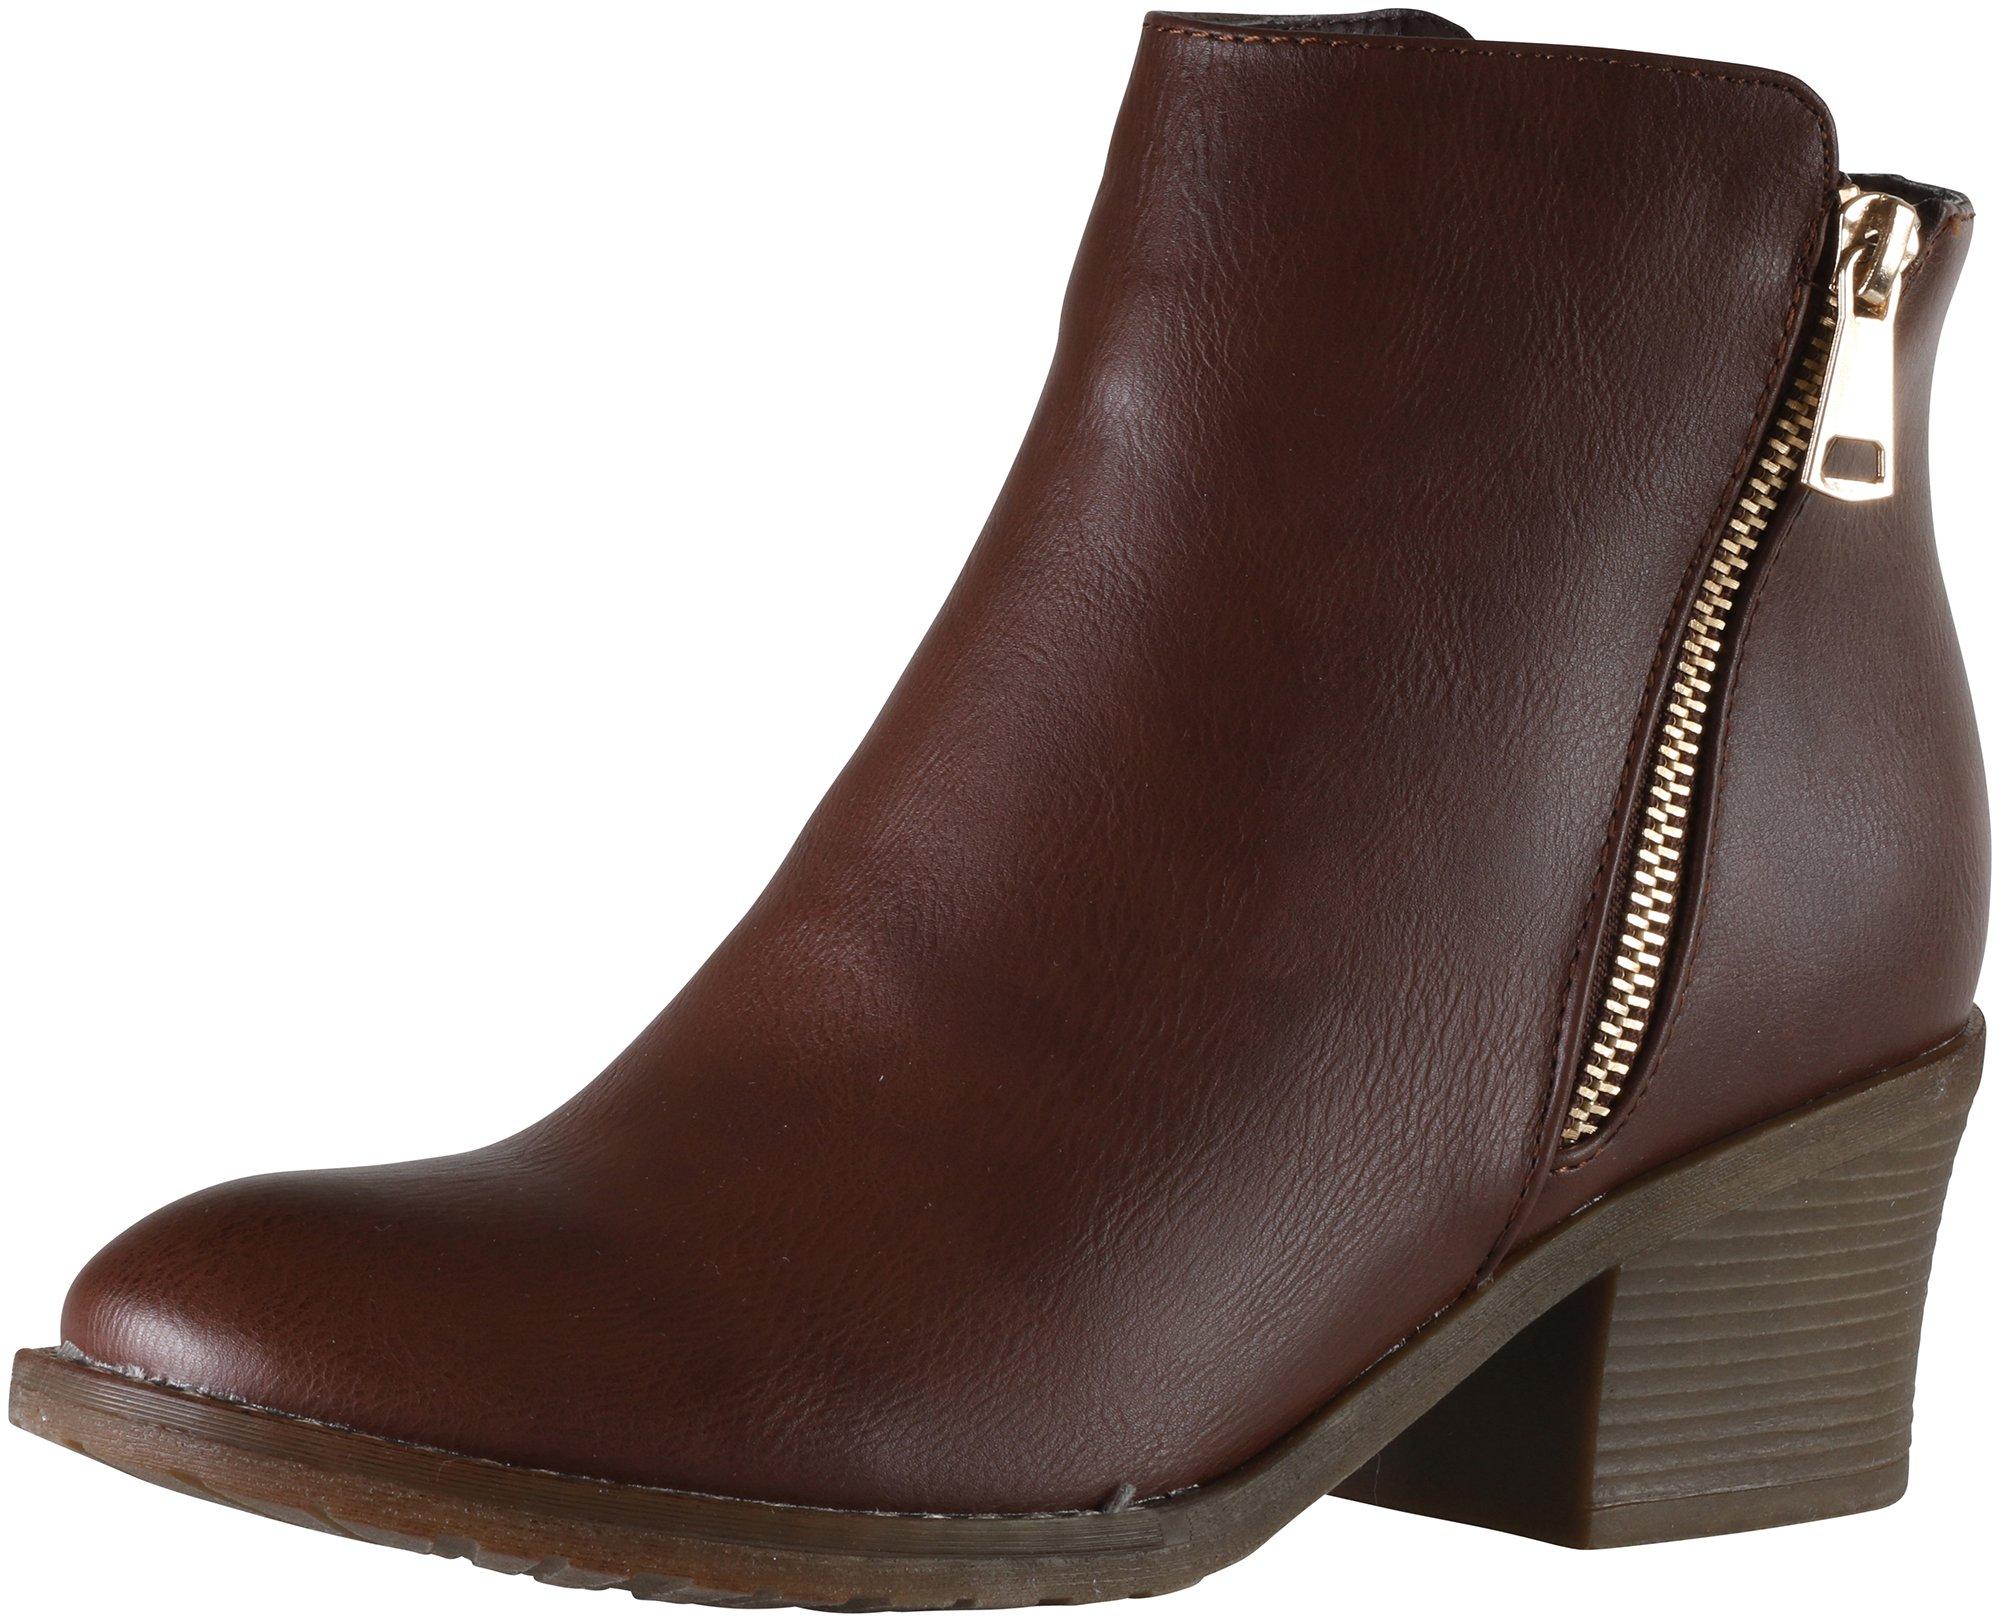 Reneeze Women's Pama-02 Two-tone Metallic Zipper Chunky Heel Ankle Boot (10 B(M) US, Brown)